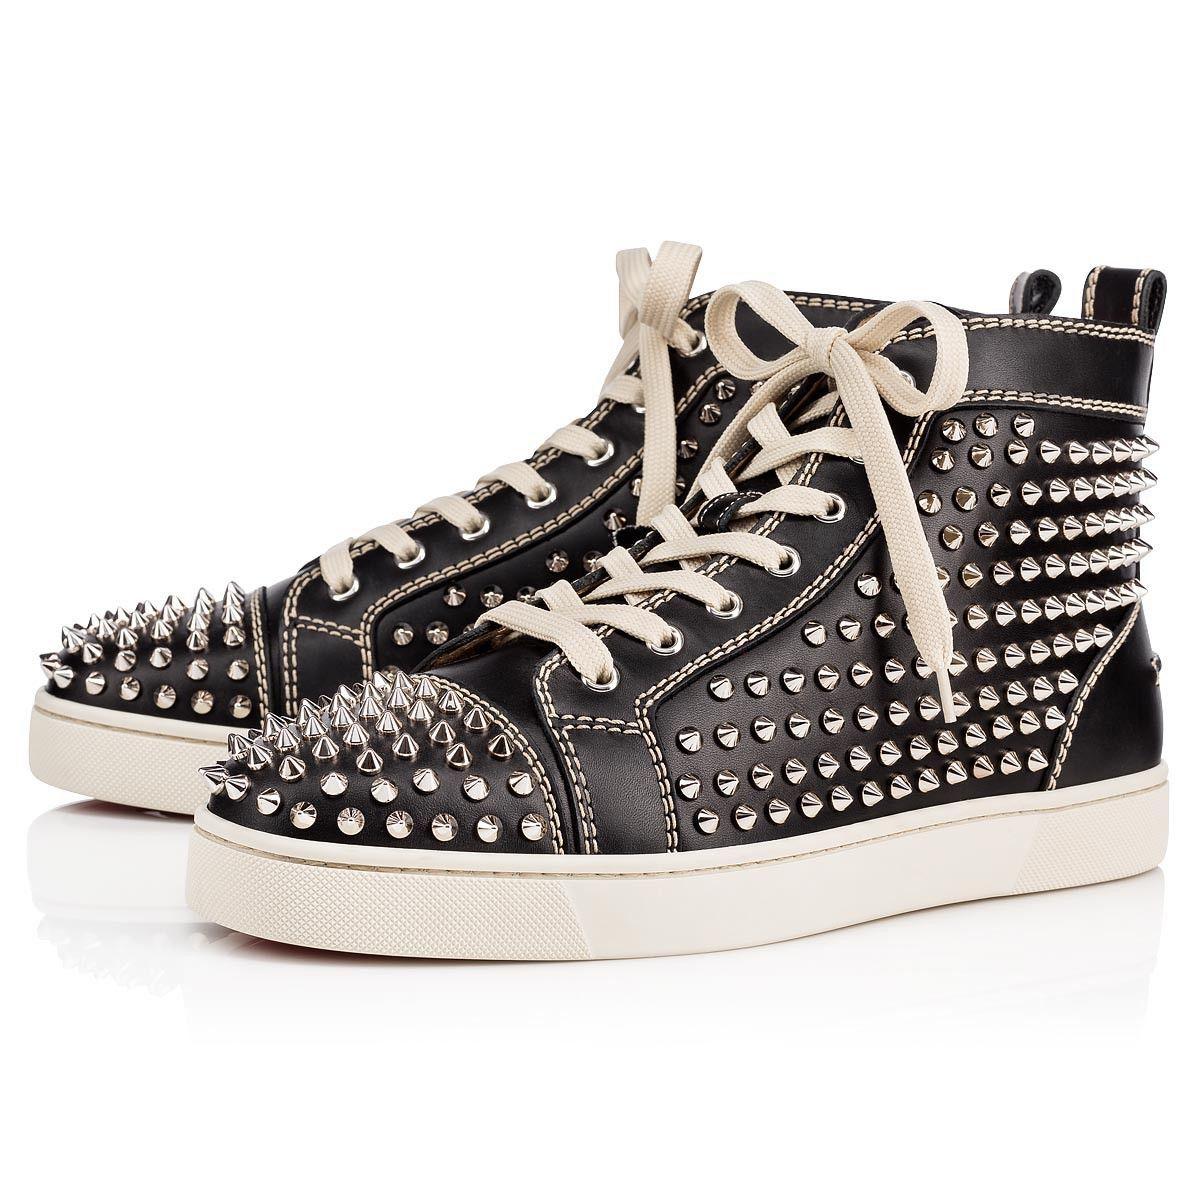 e2b695e85a5 Louis Spikes Men's Flat Black/Silver Leather - Men Shoes - Christian ...